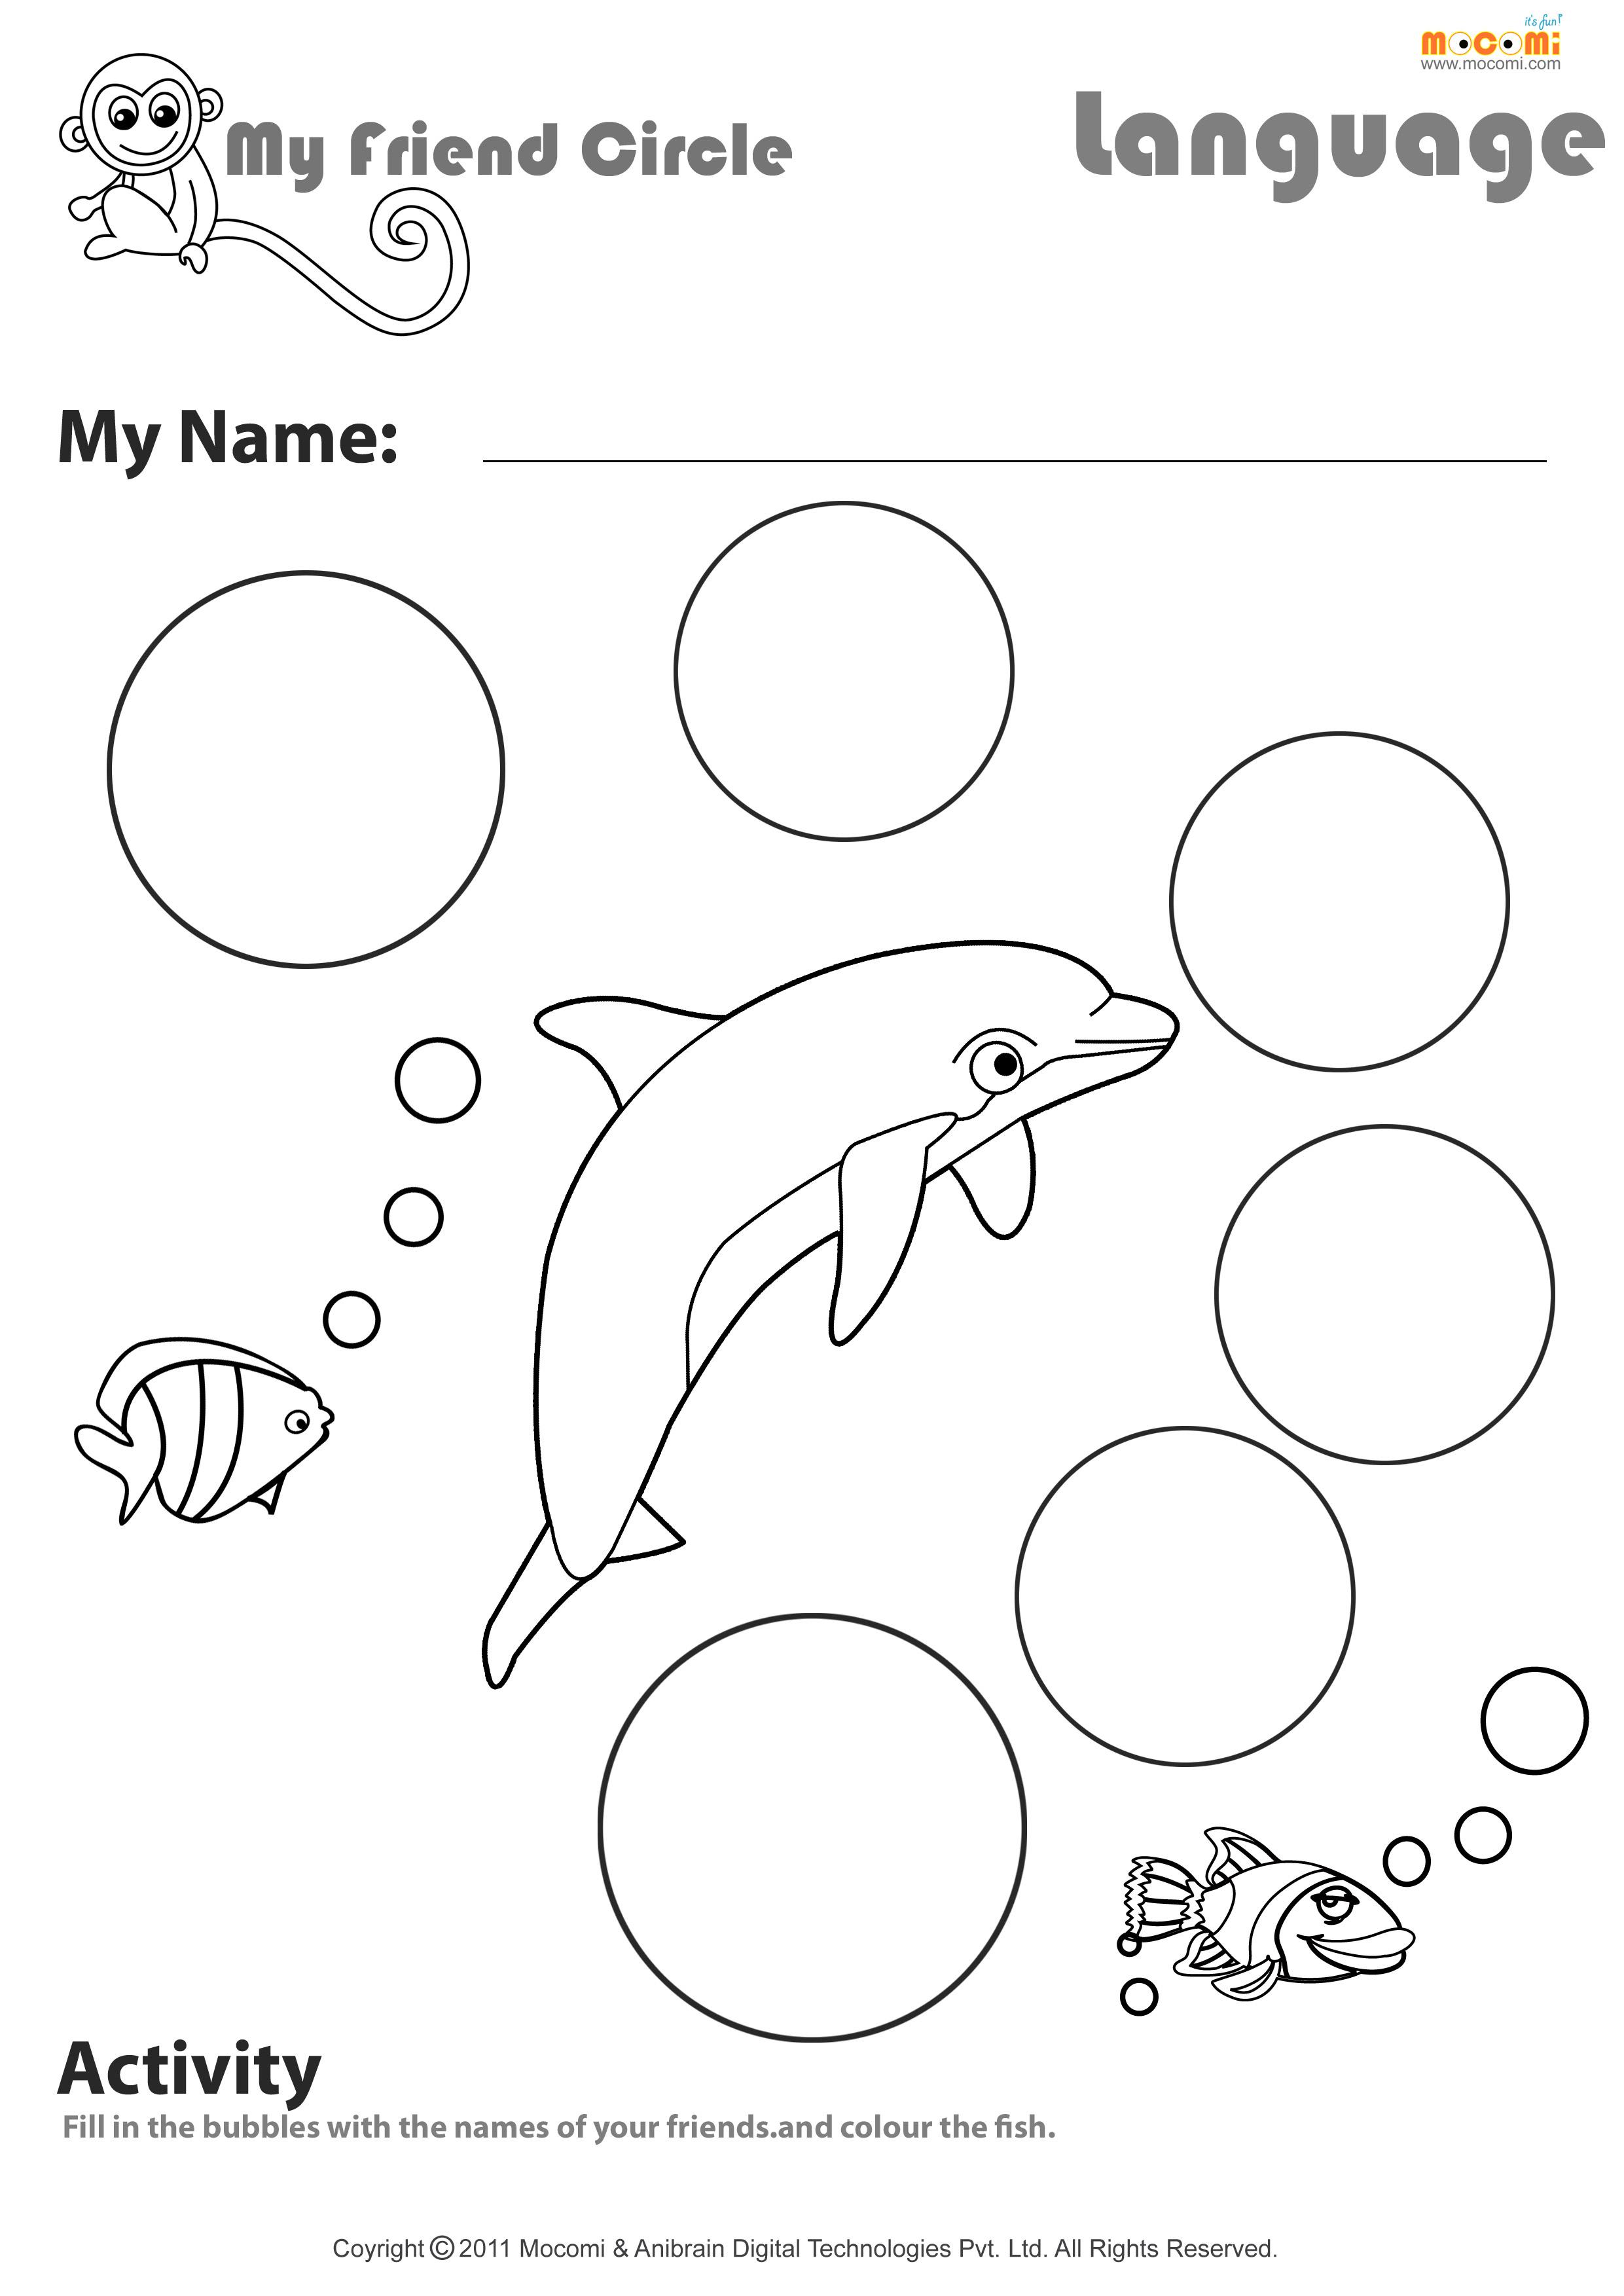 Niagara Falls Drawing For Kids At Getdrawings